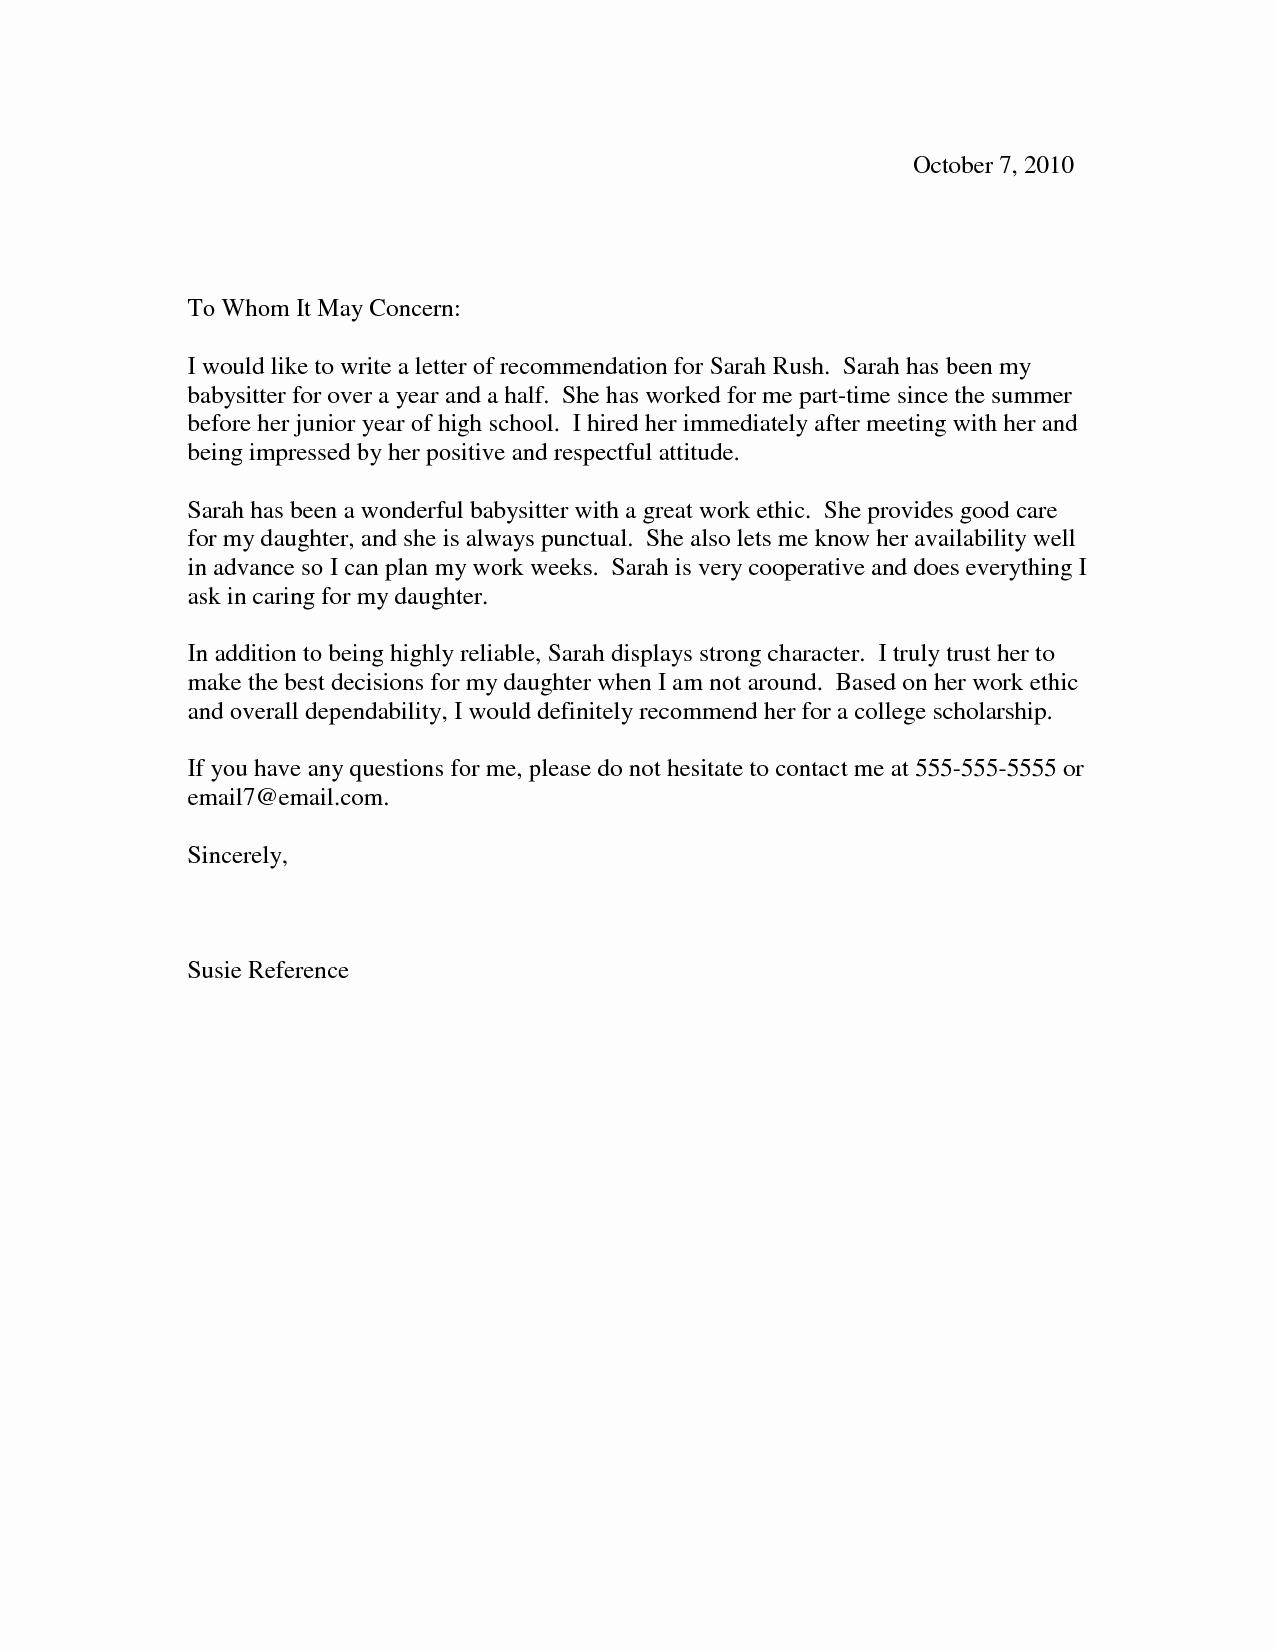 Scholarship Recommendation Letter Templates Elegant Scholarship Re Mendation Letter Scholarship